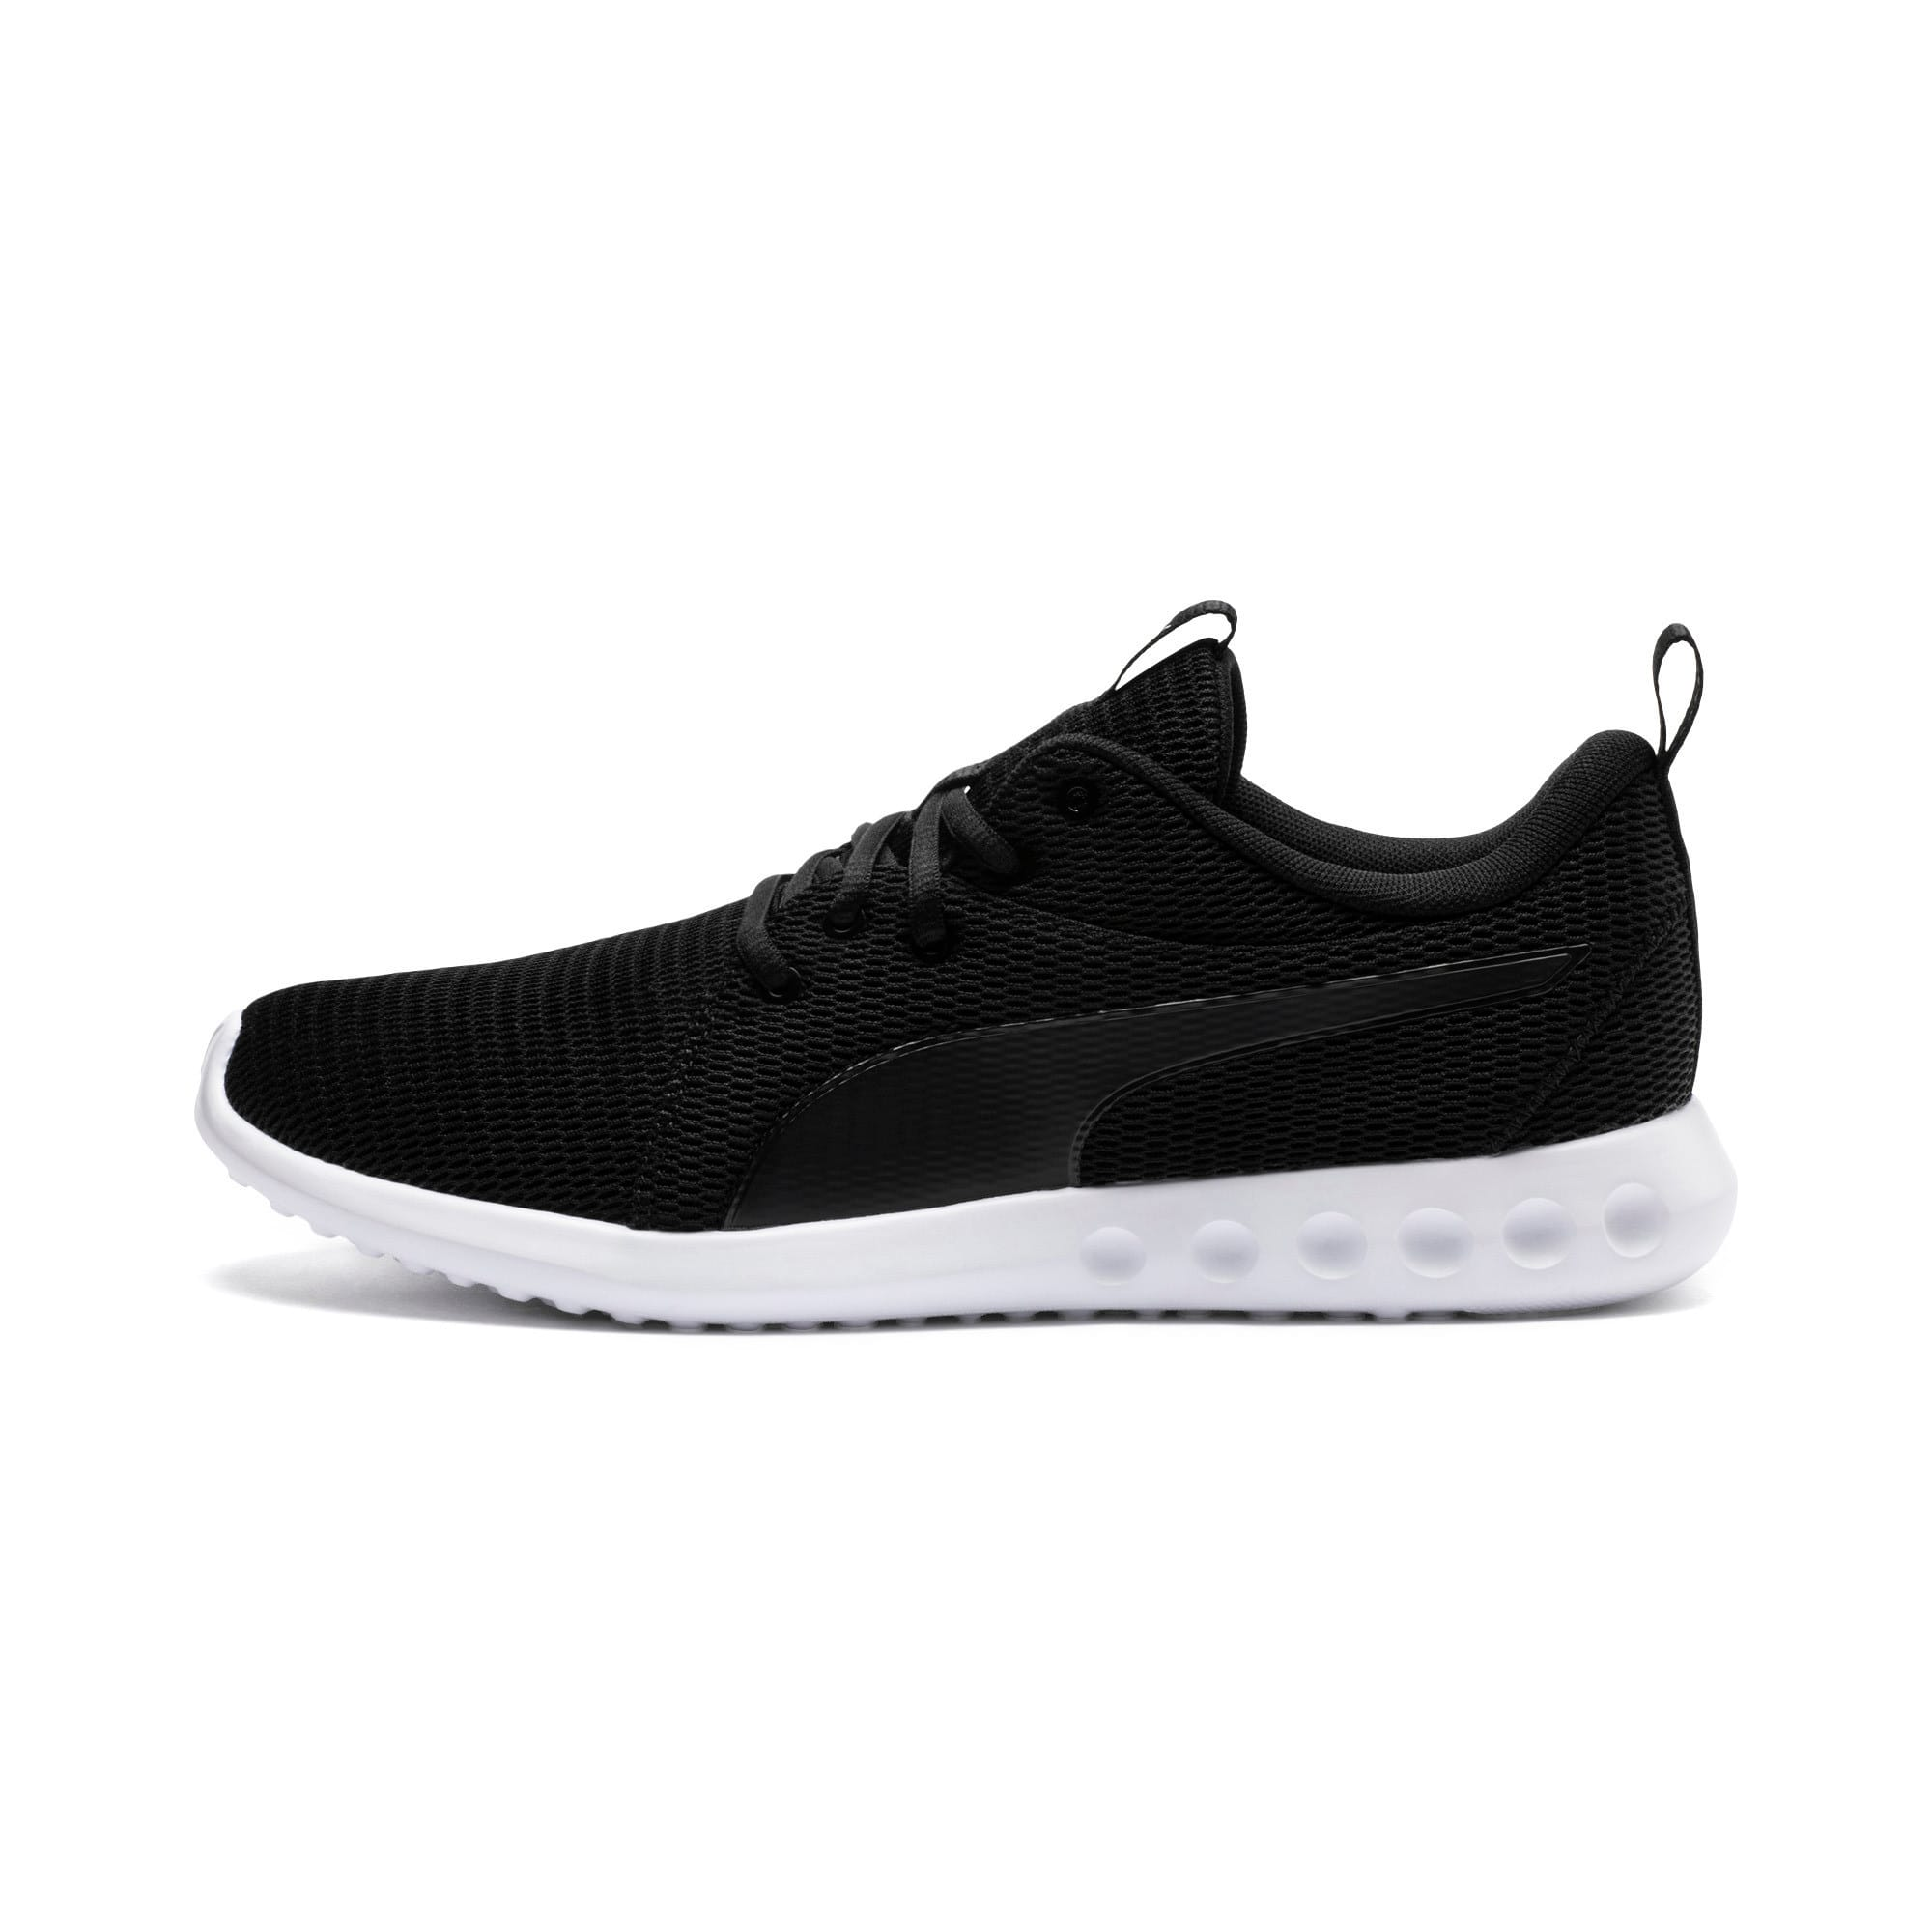 Thumbnail 1 of Carson 2 New Core Men's Running Shoes, Puma Black-Puma White, medium